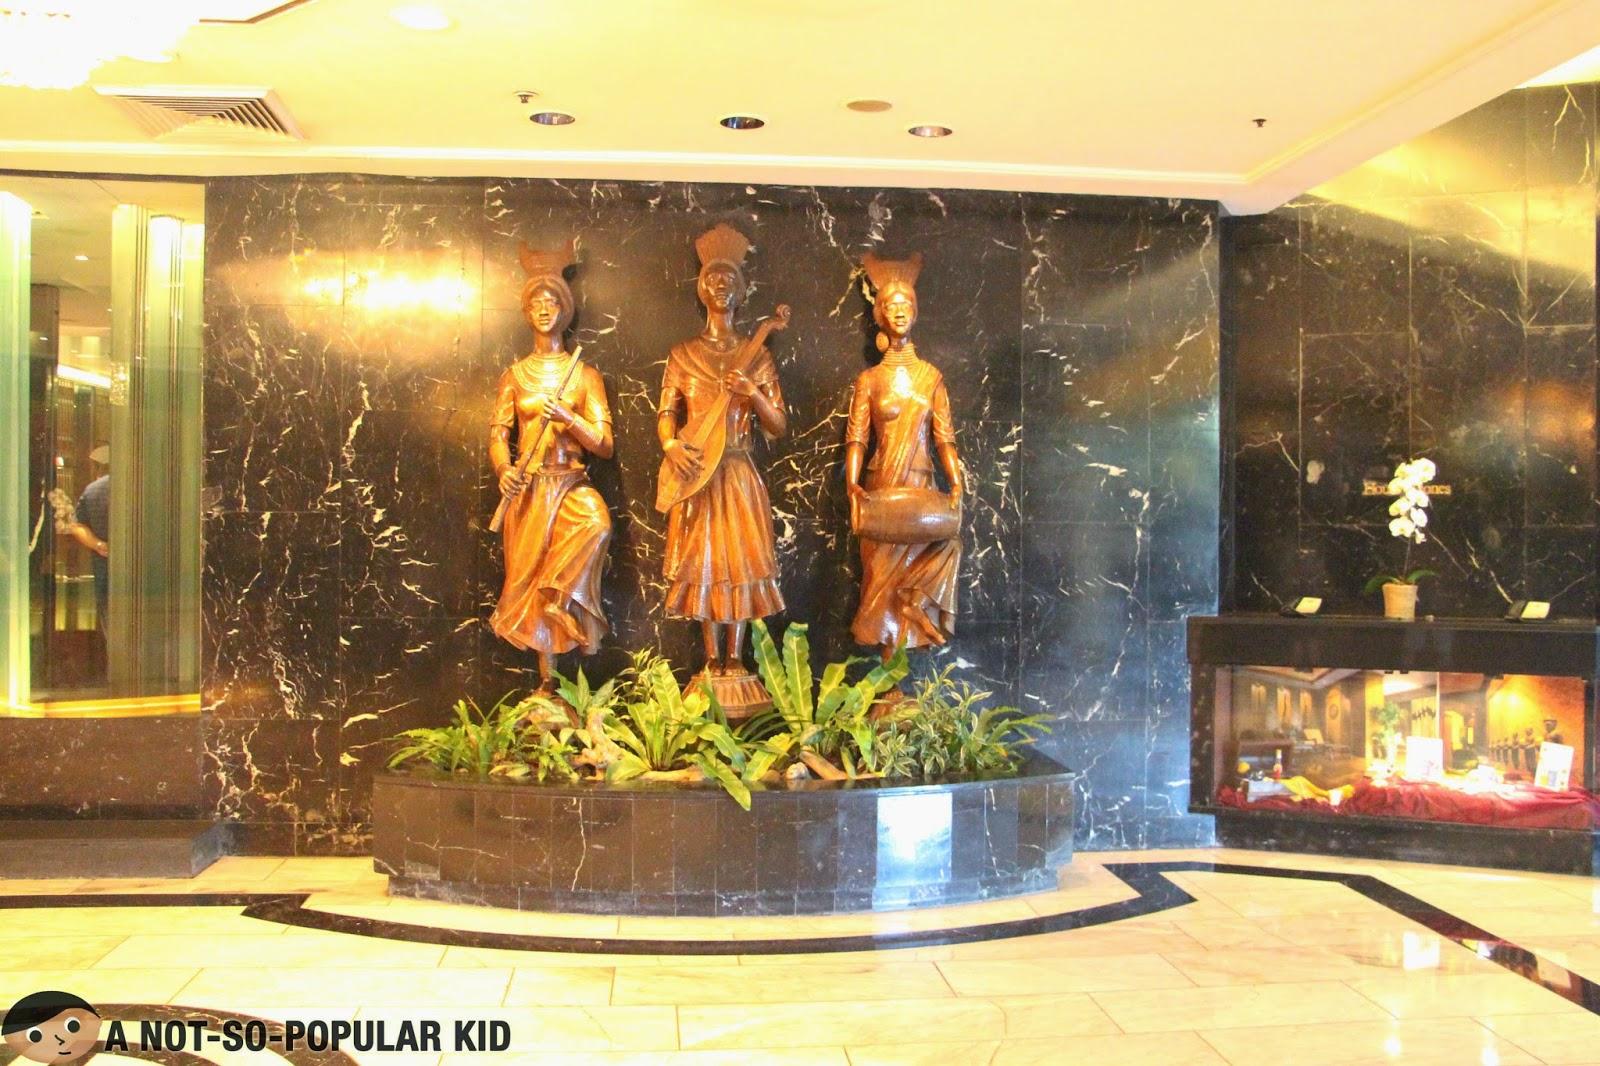 Mandarin Oriental Hotel in Makati, Metro Manila